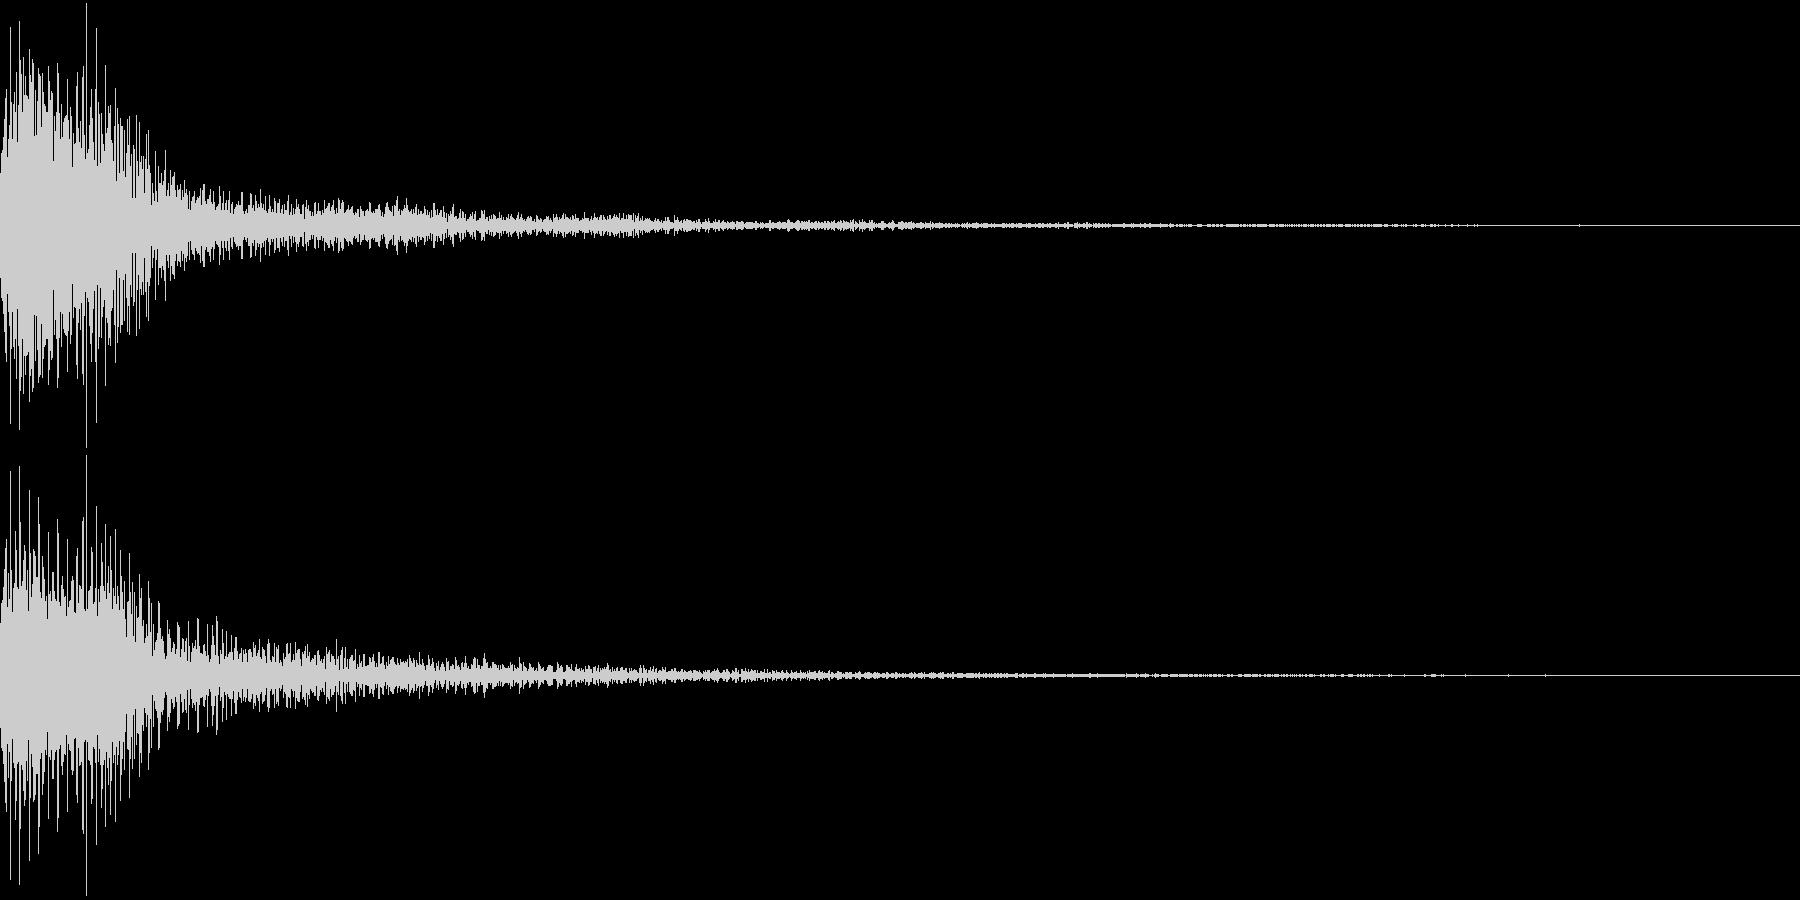 Moog ファットなコマンド音 4の未再生の波形